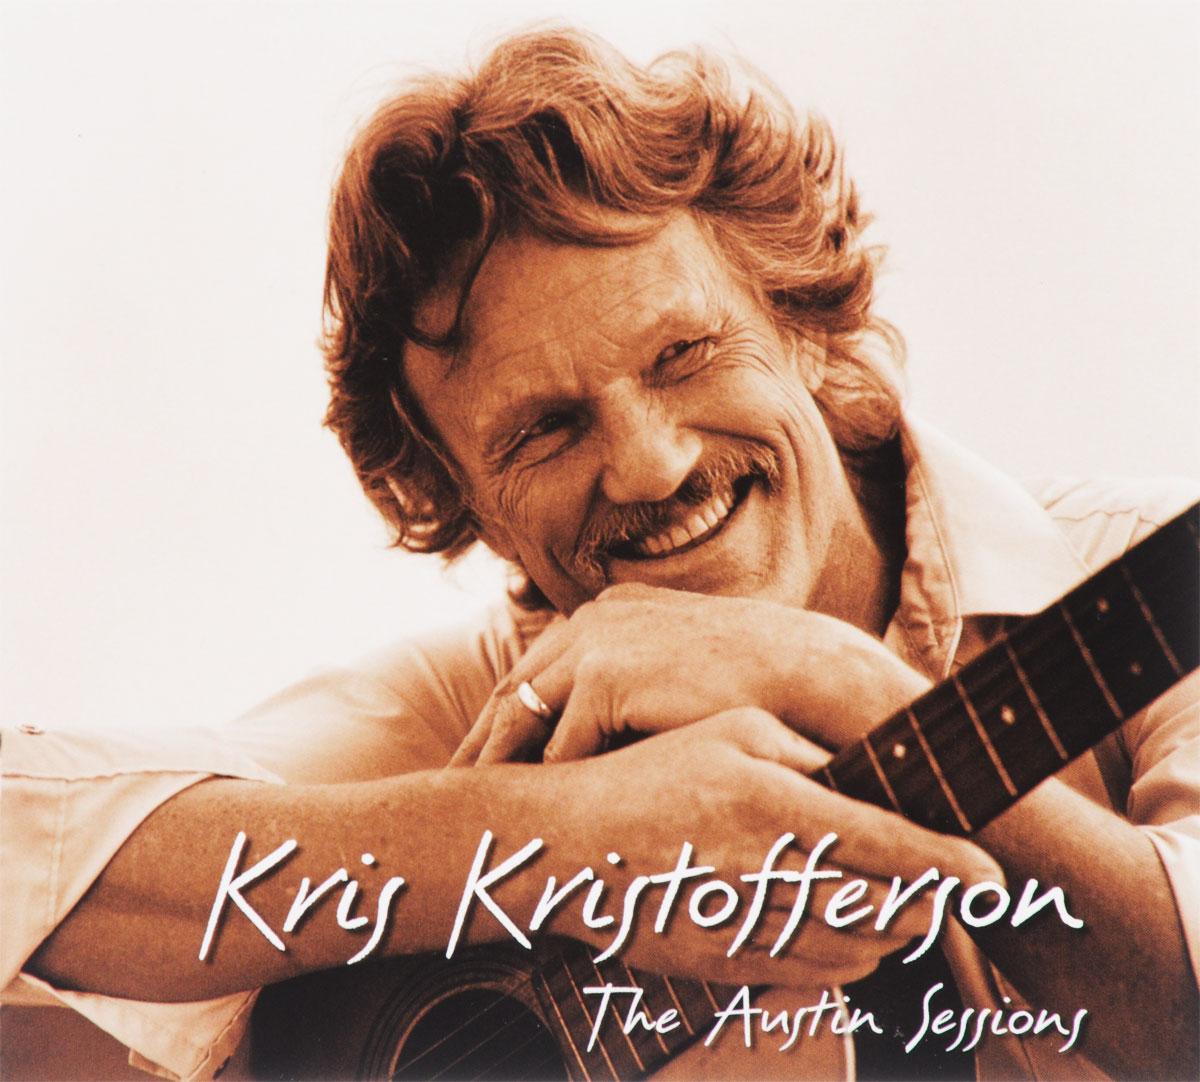 лучшая цена Крис Кристофферсон Kris Kristofferson. The Austin Sessions. Special Expanded Edition